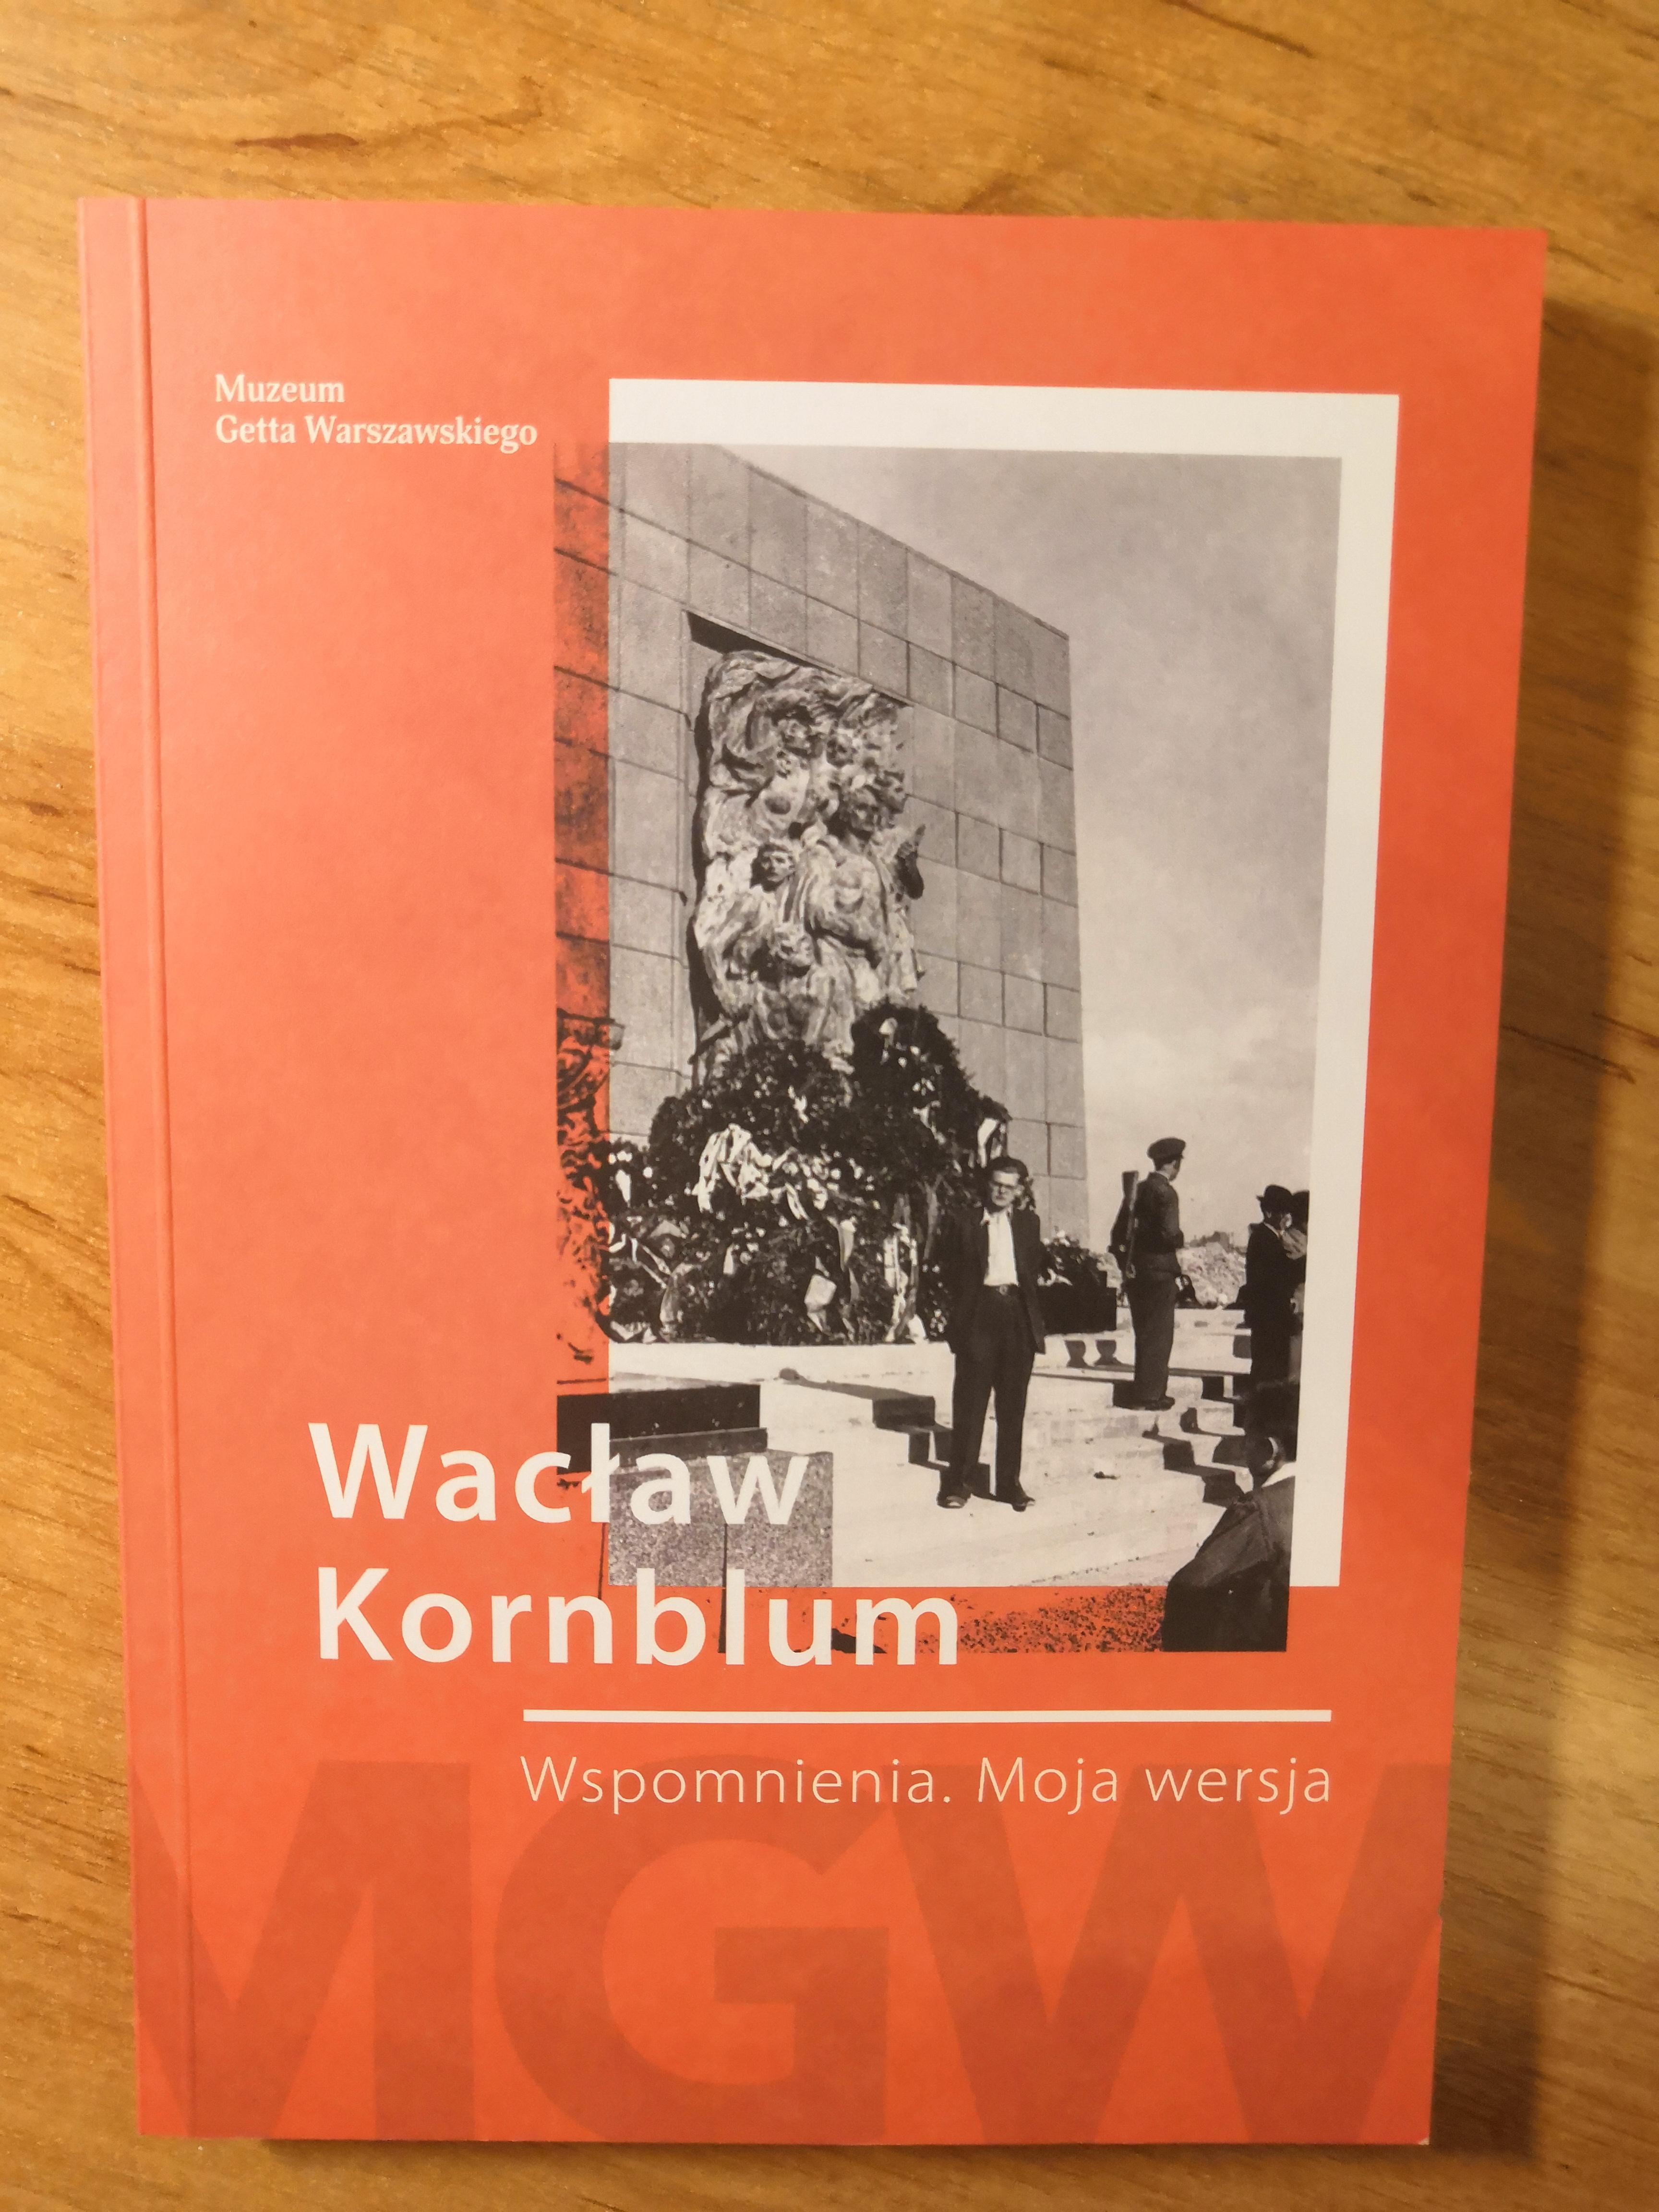 Wspomnienia Moja wersja (W.Kornblum)